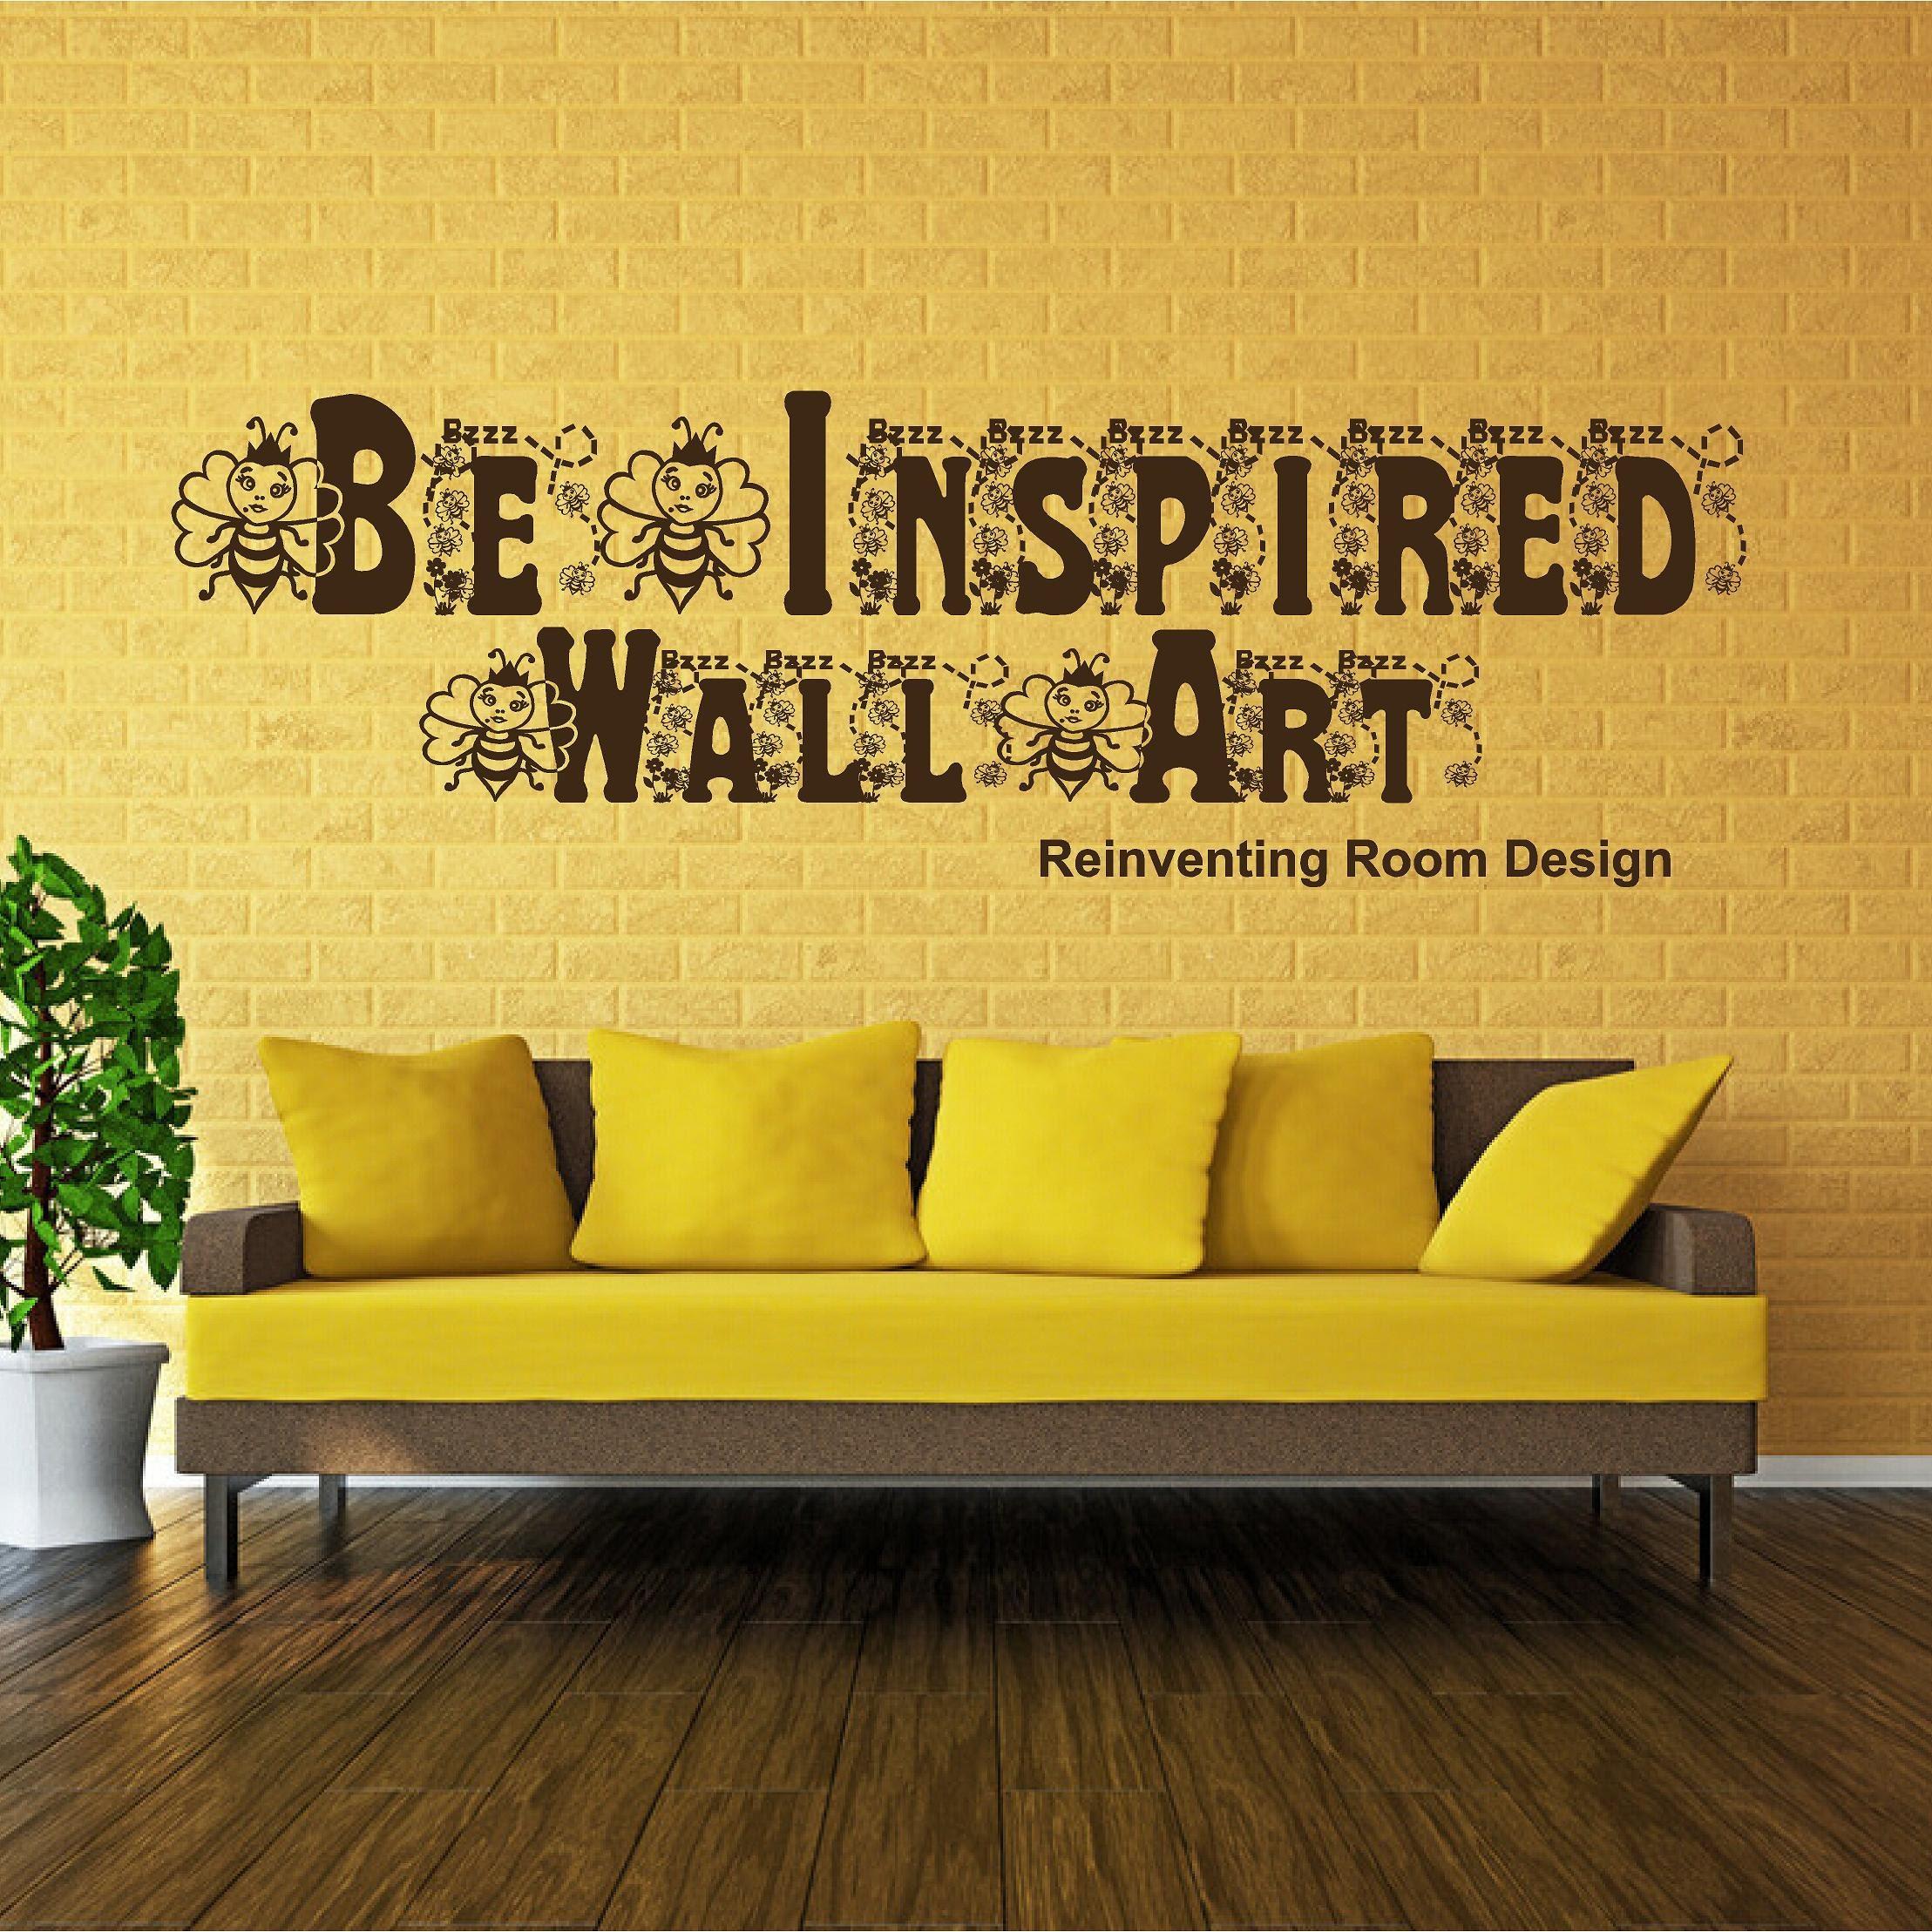 Batman Medium Size Wall Decal Wall art Sticker